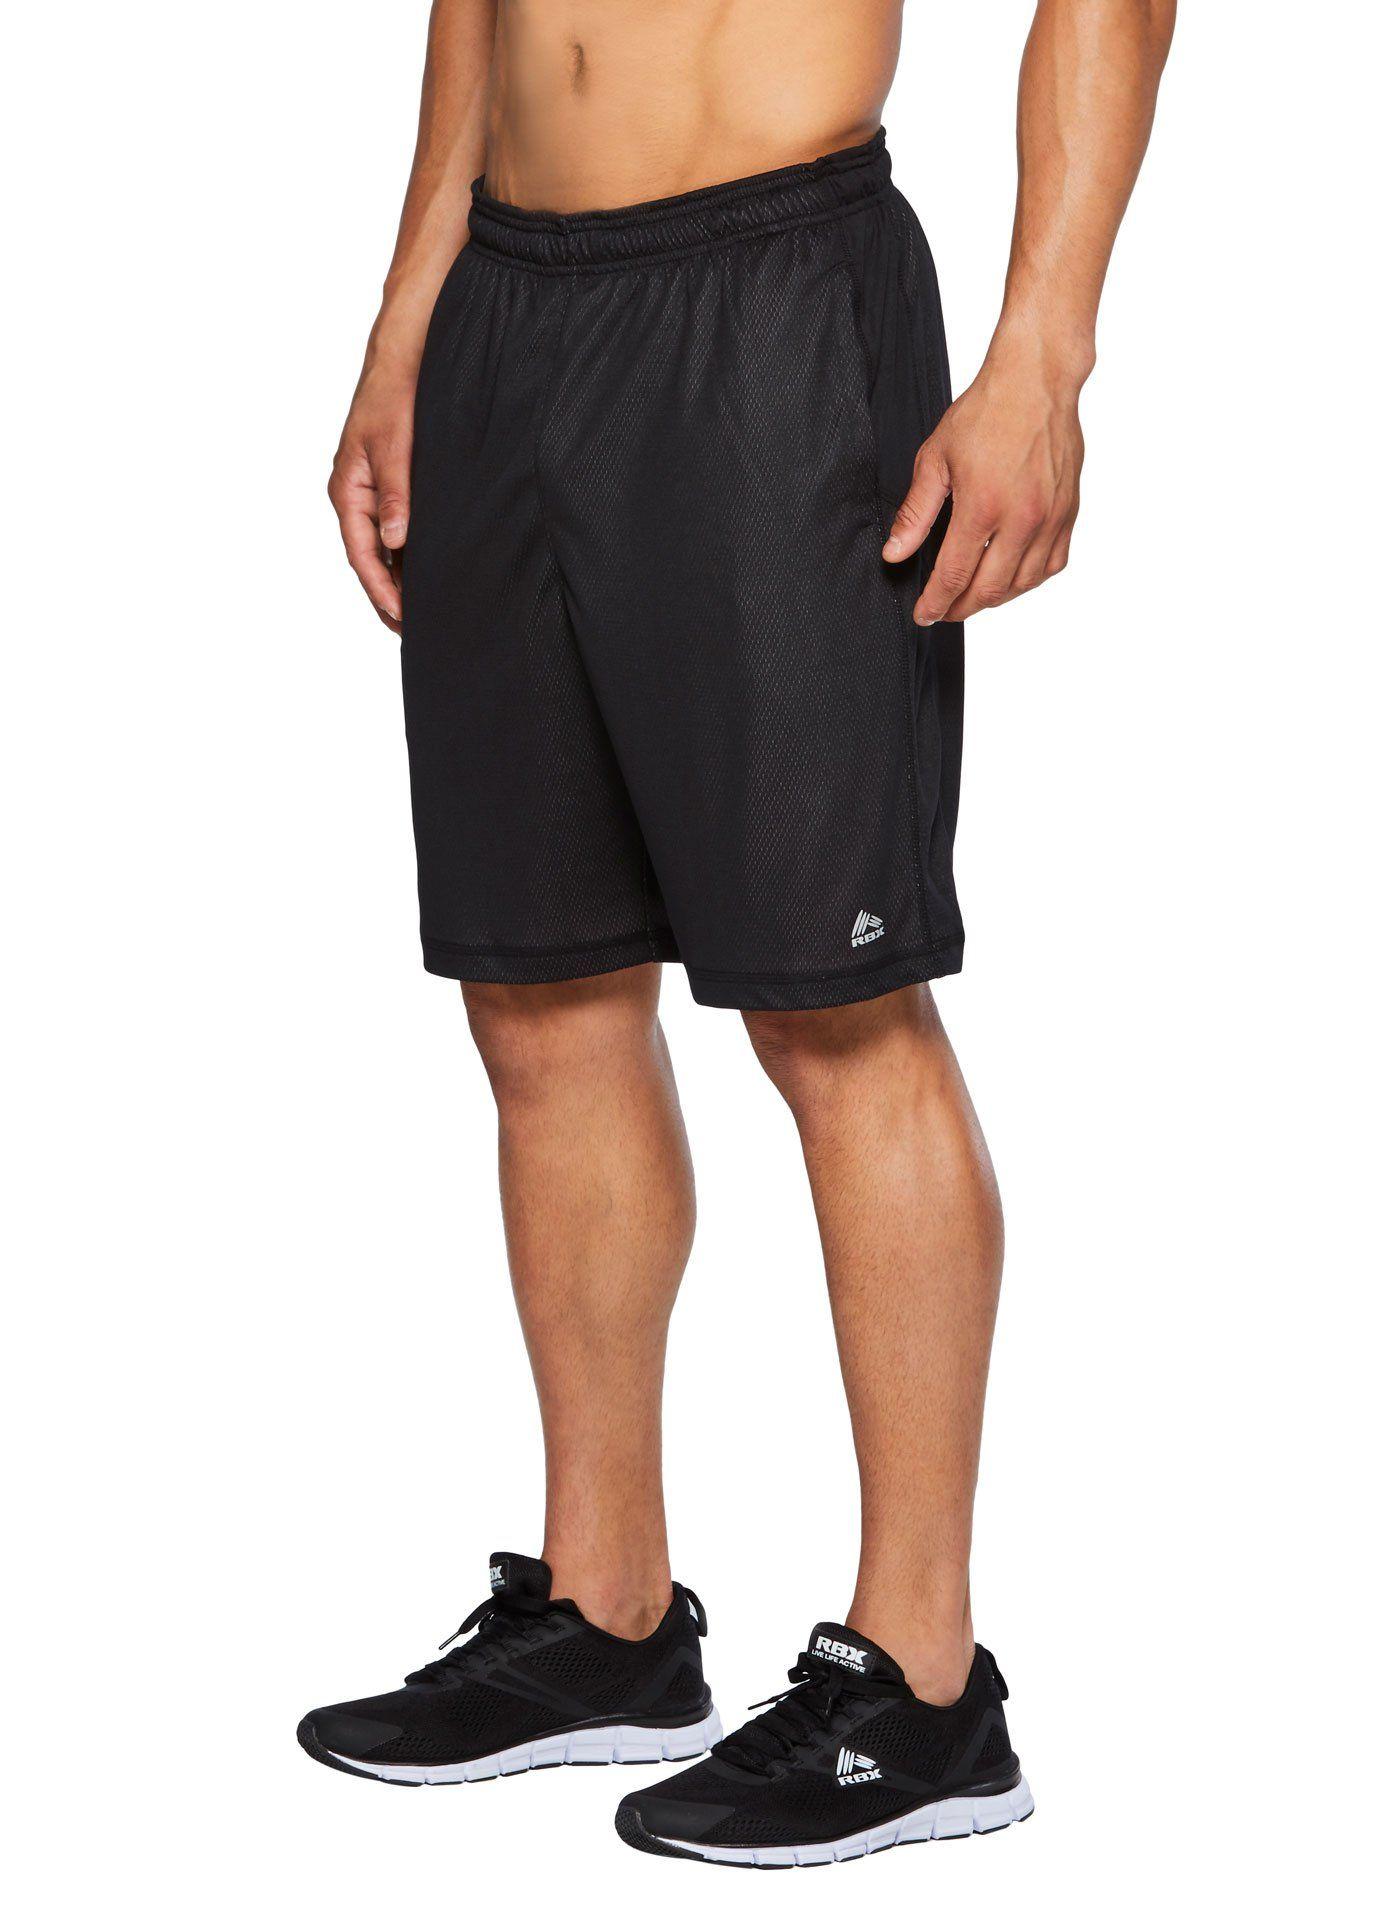 9eea859f24377 RBX Active Men s Multi-Layered Free Motion Gym Shorts Black Graphite XL. X